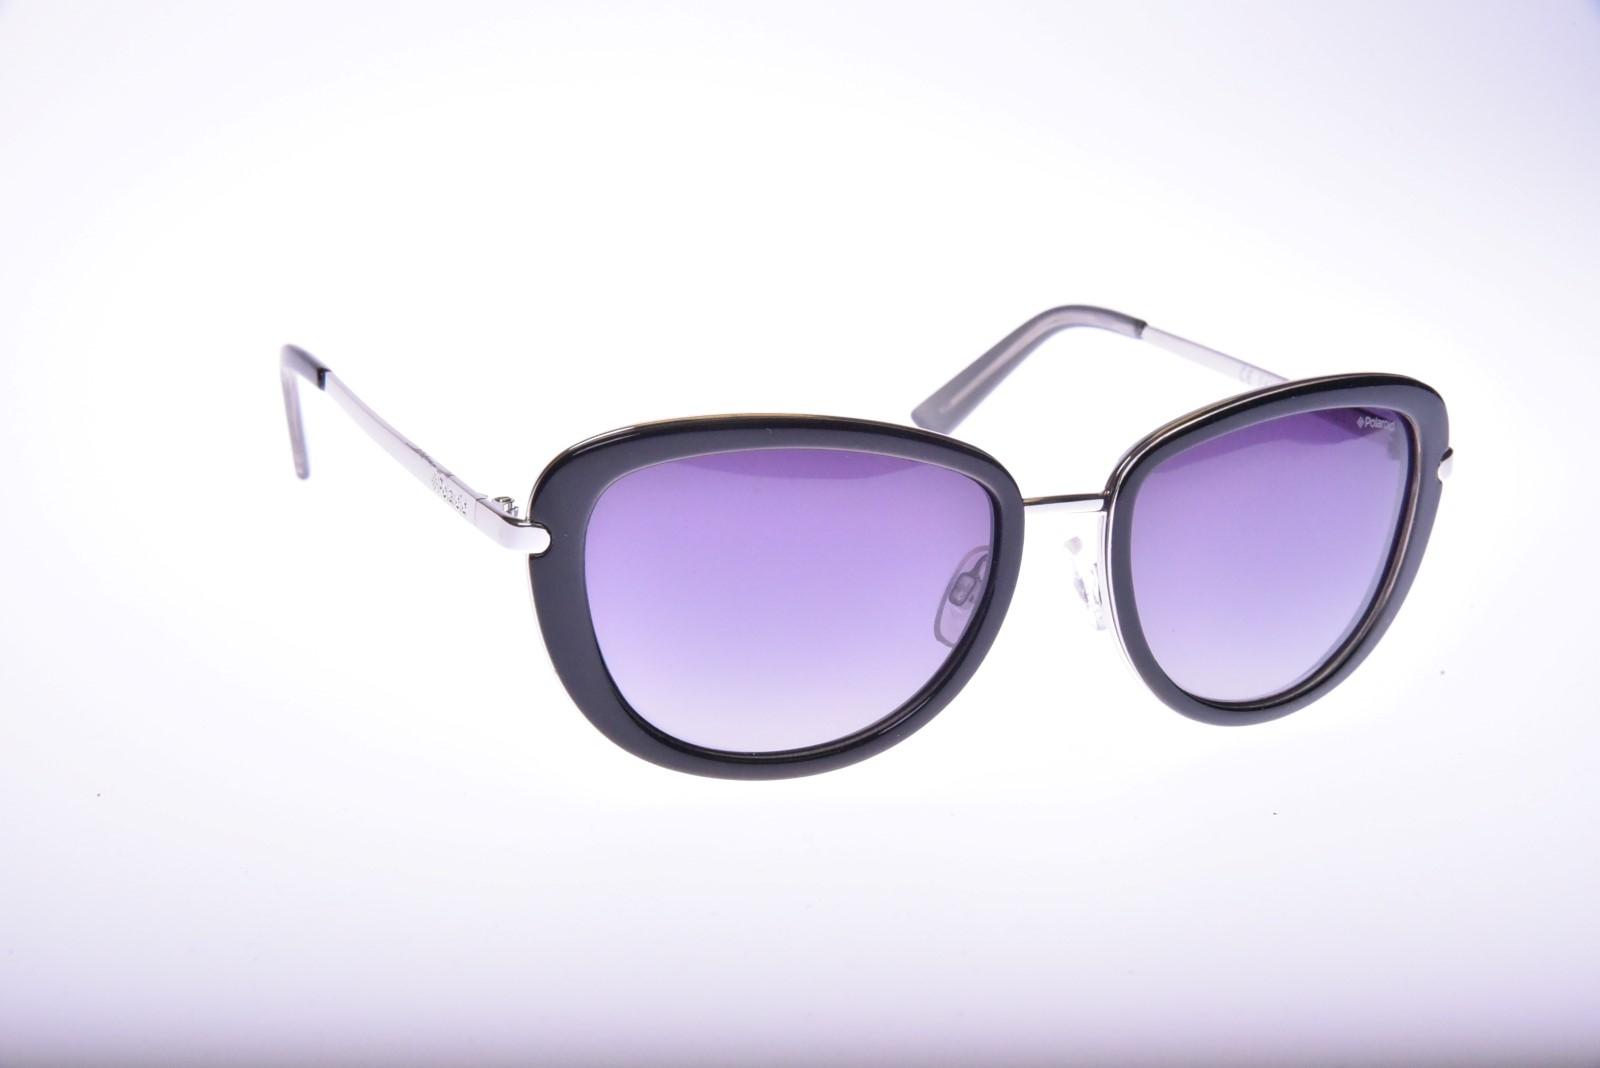 Polaroid Superior F4304C - Dámske slnečné okuliare